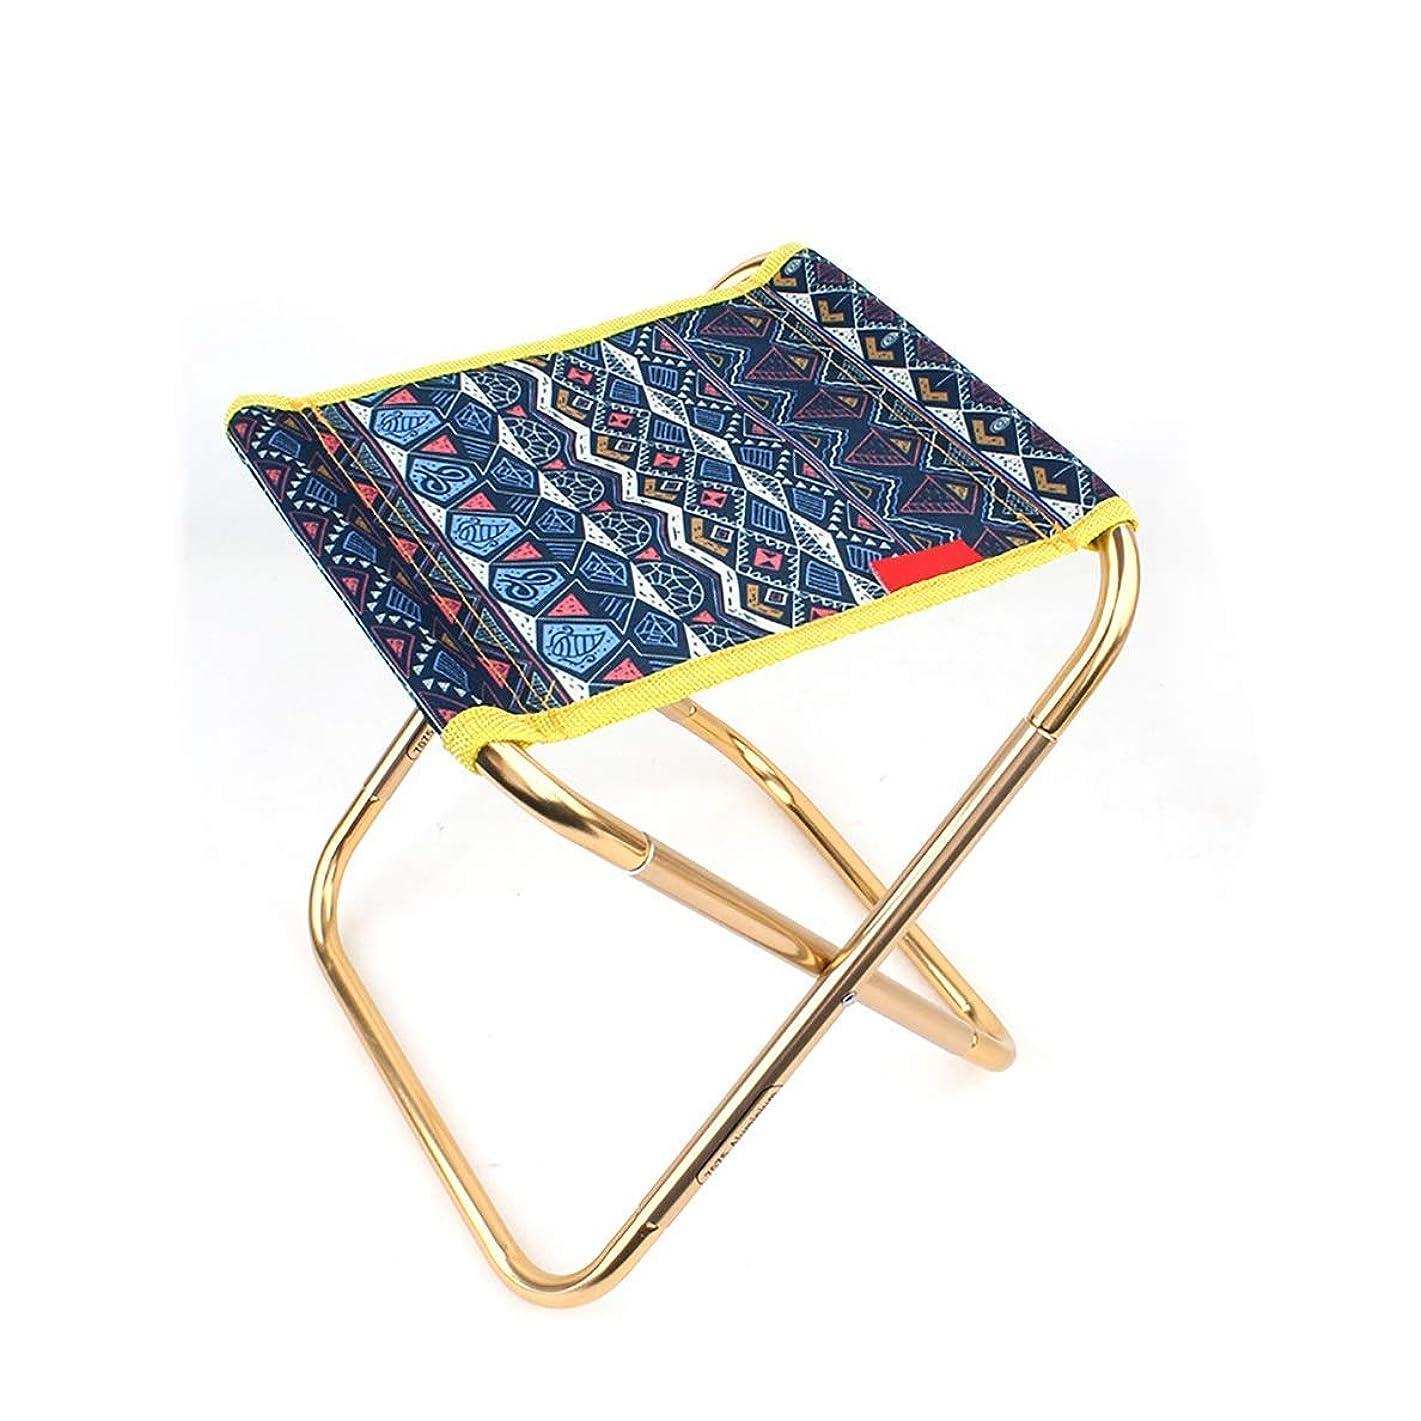 Fold Up Stool, Folding Stool Portable Outdoor Fishing Chair Subway Stool